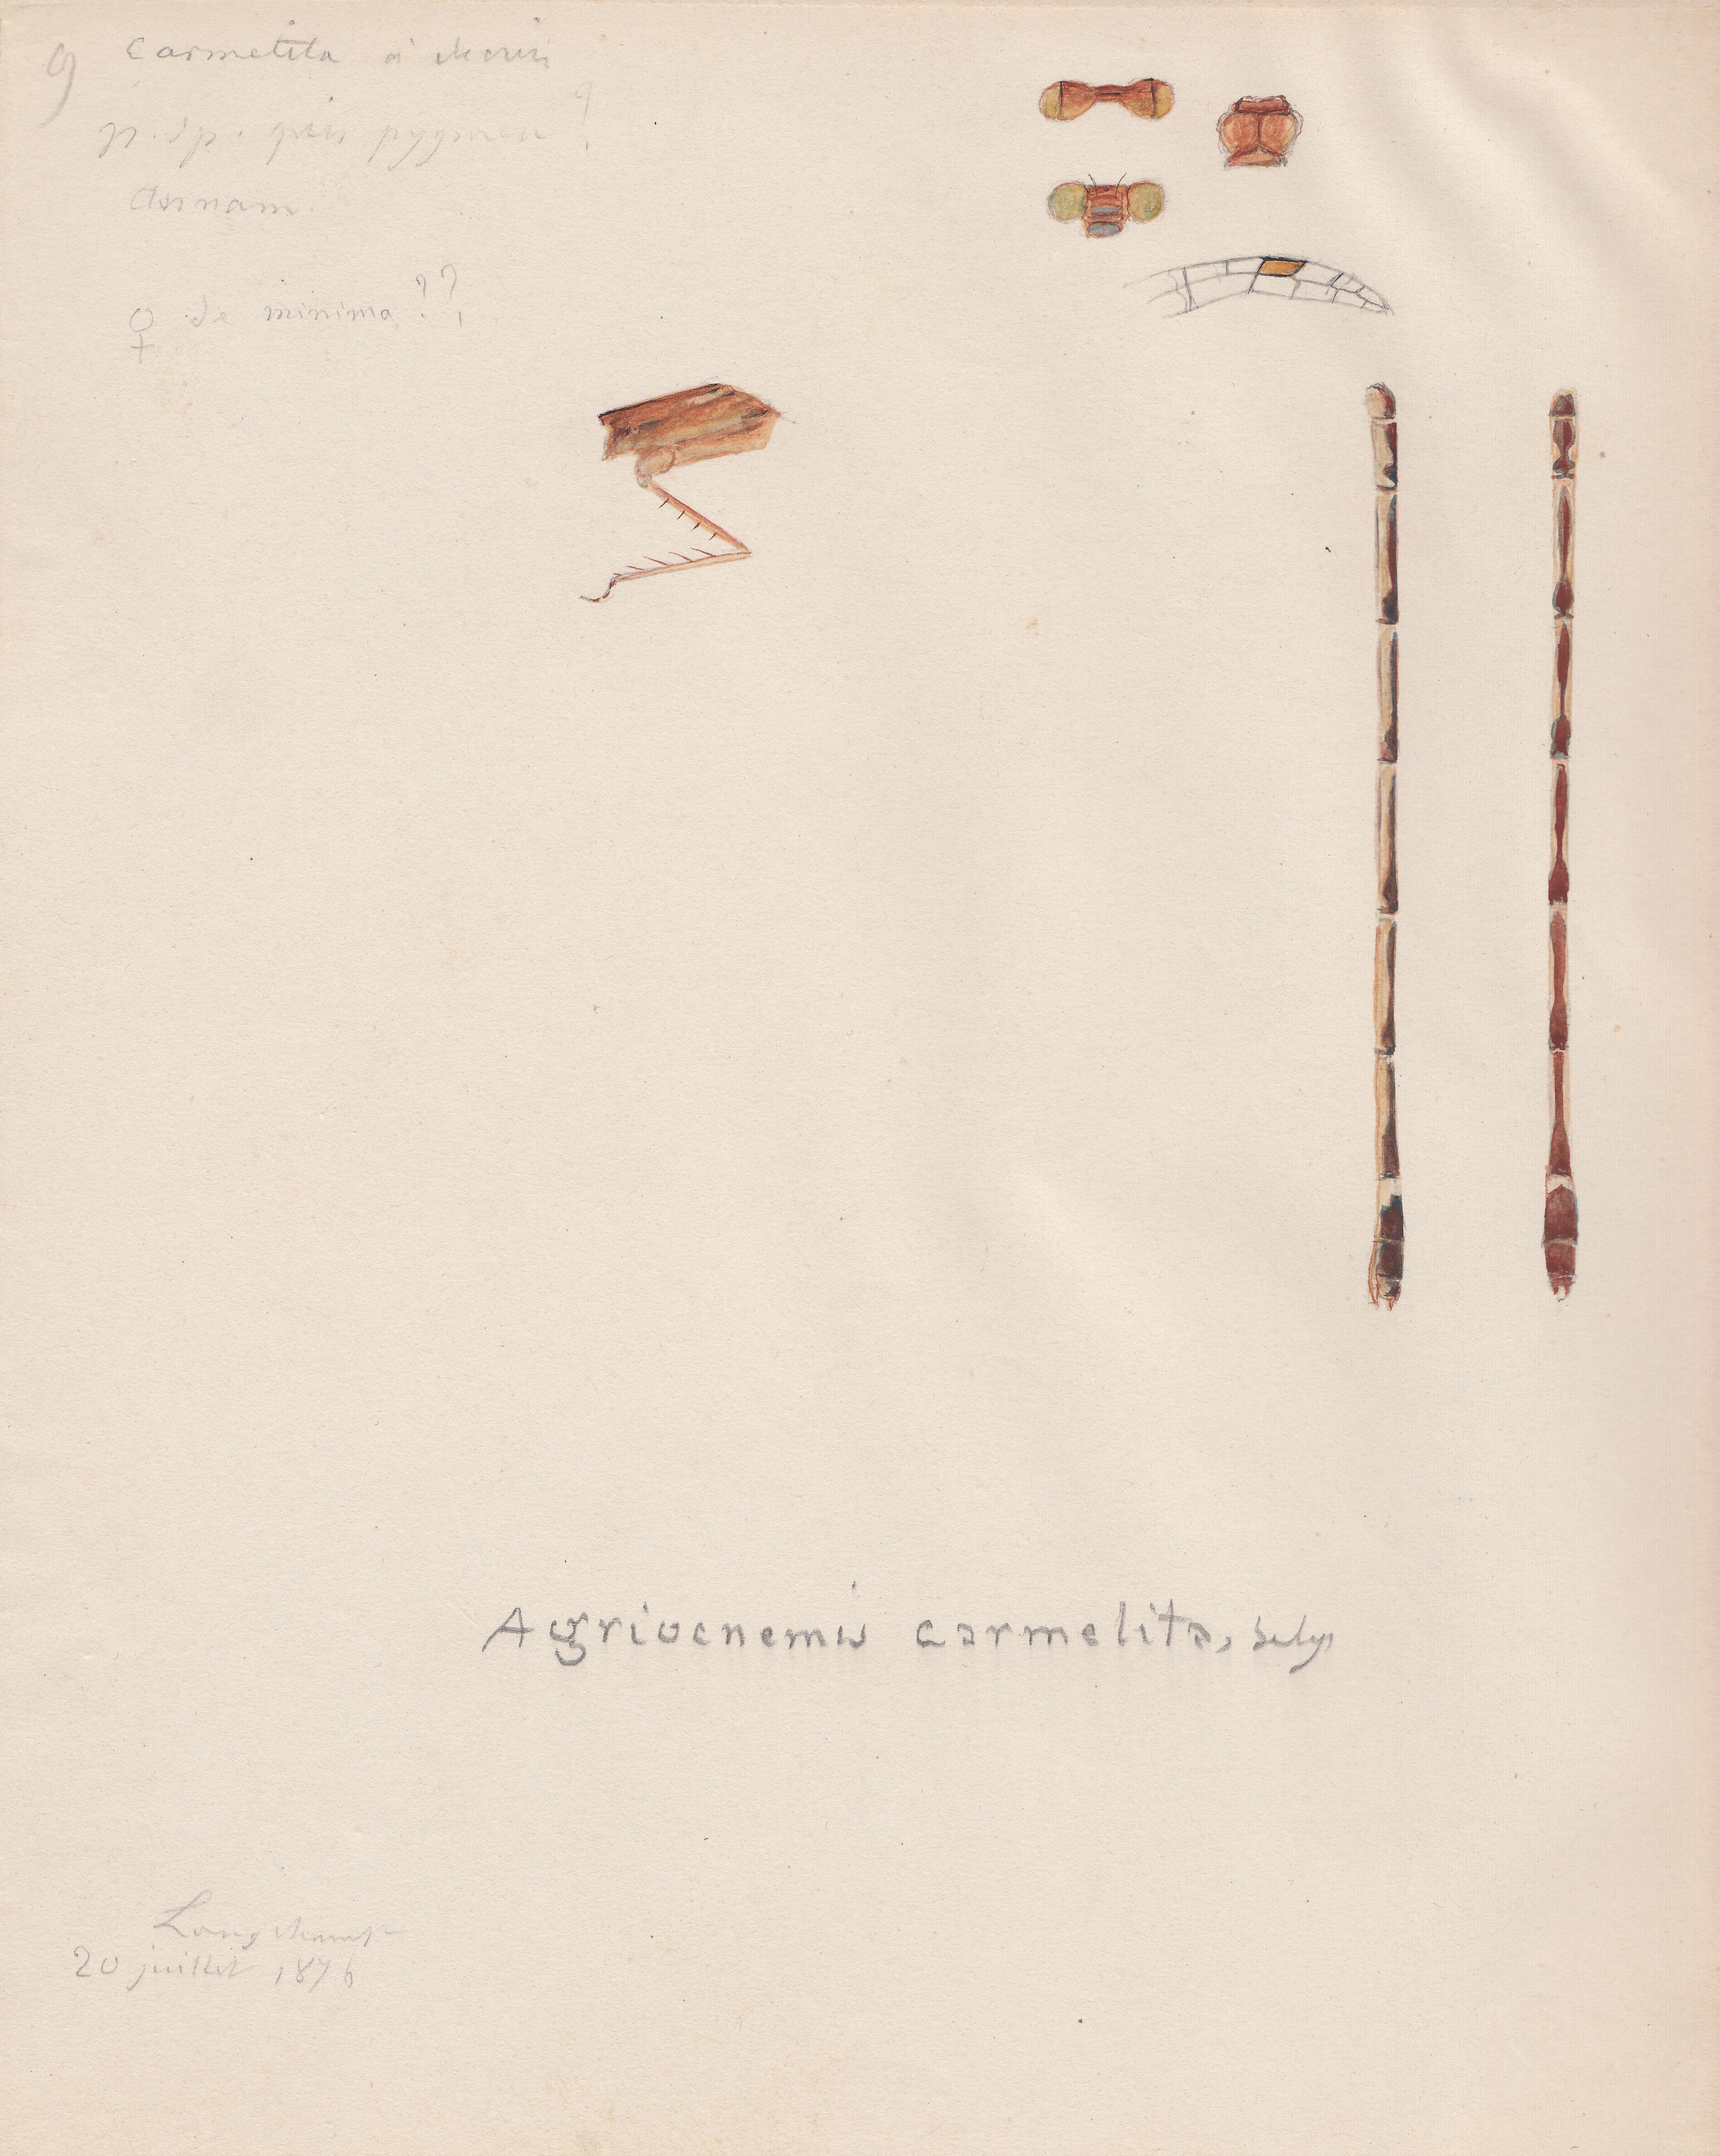 Agriocnemis carmelita.jpg